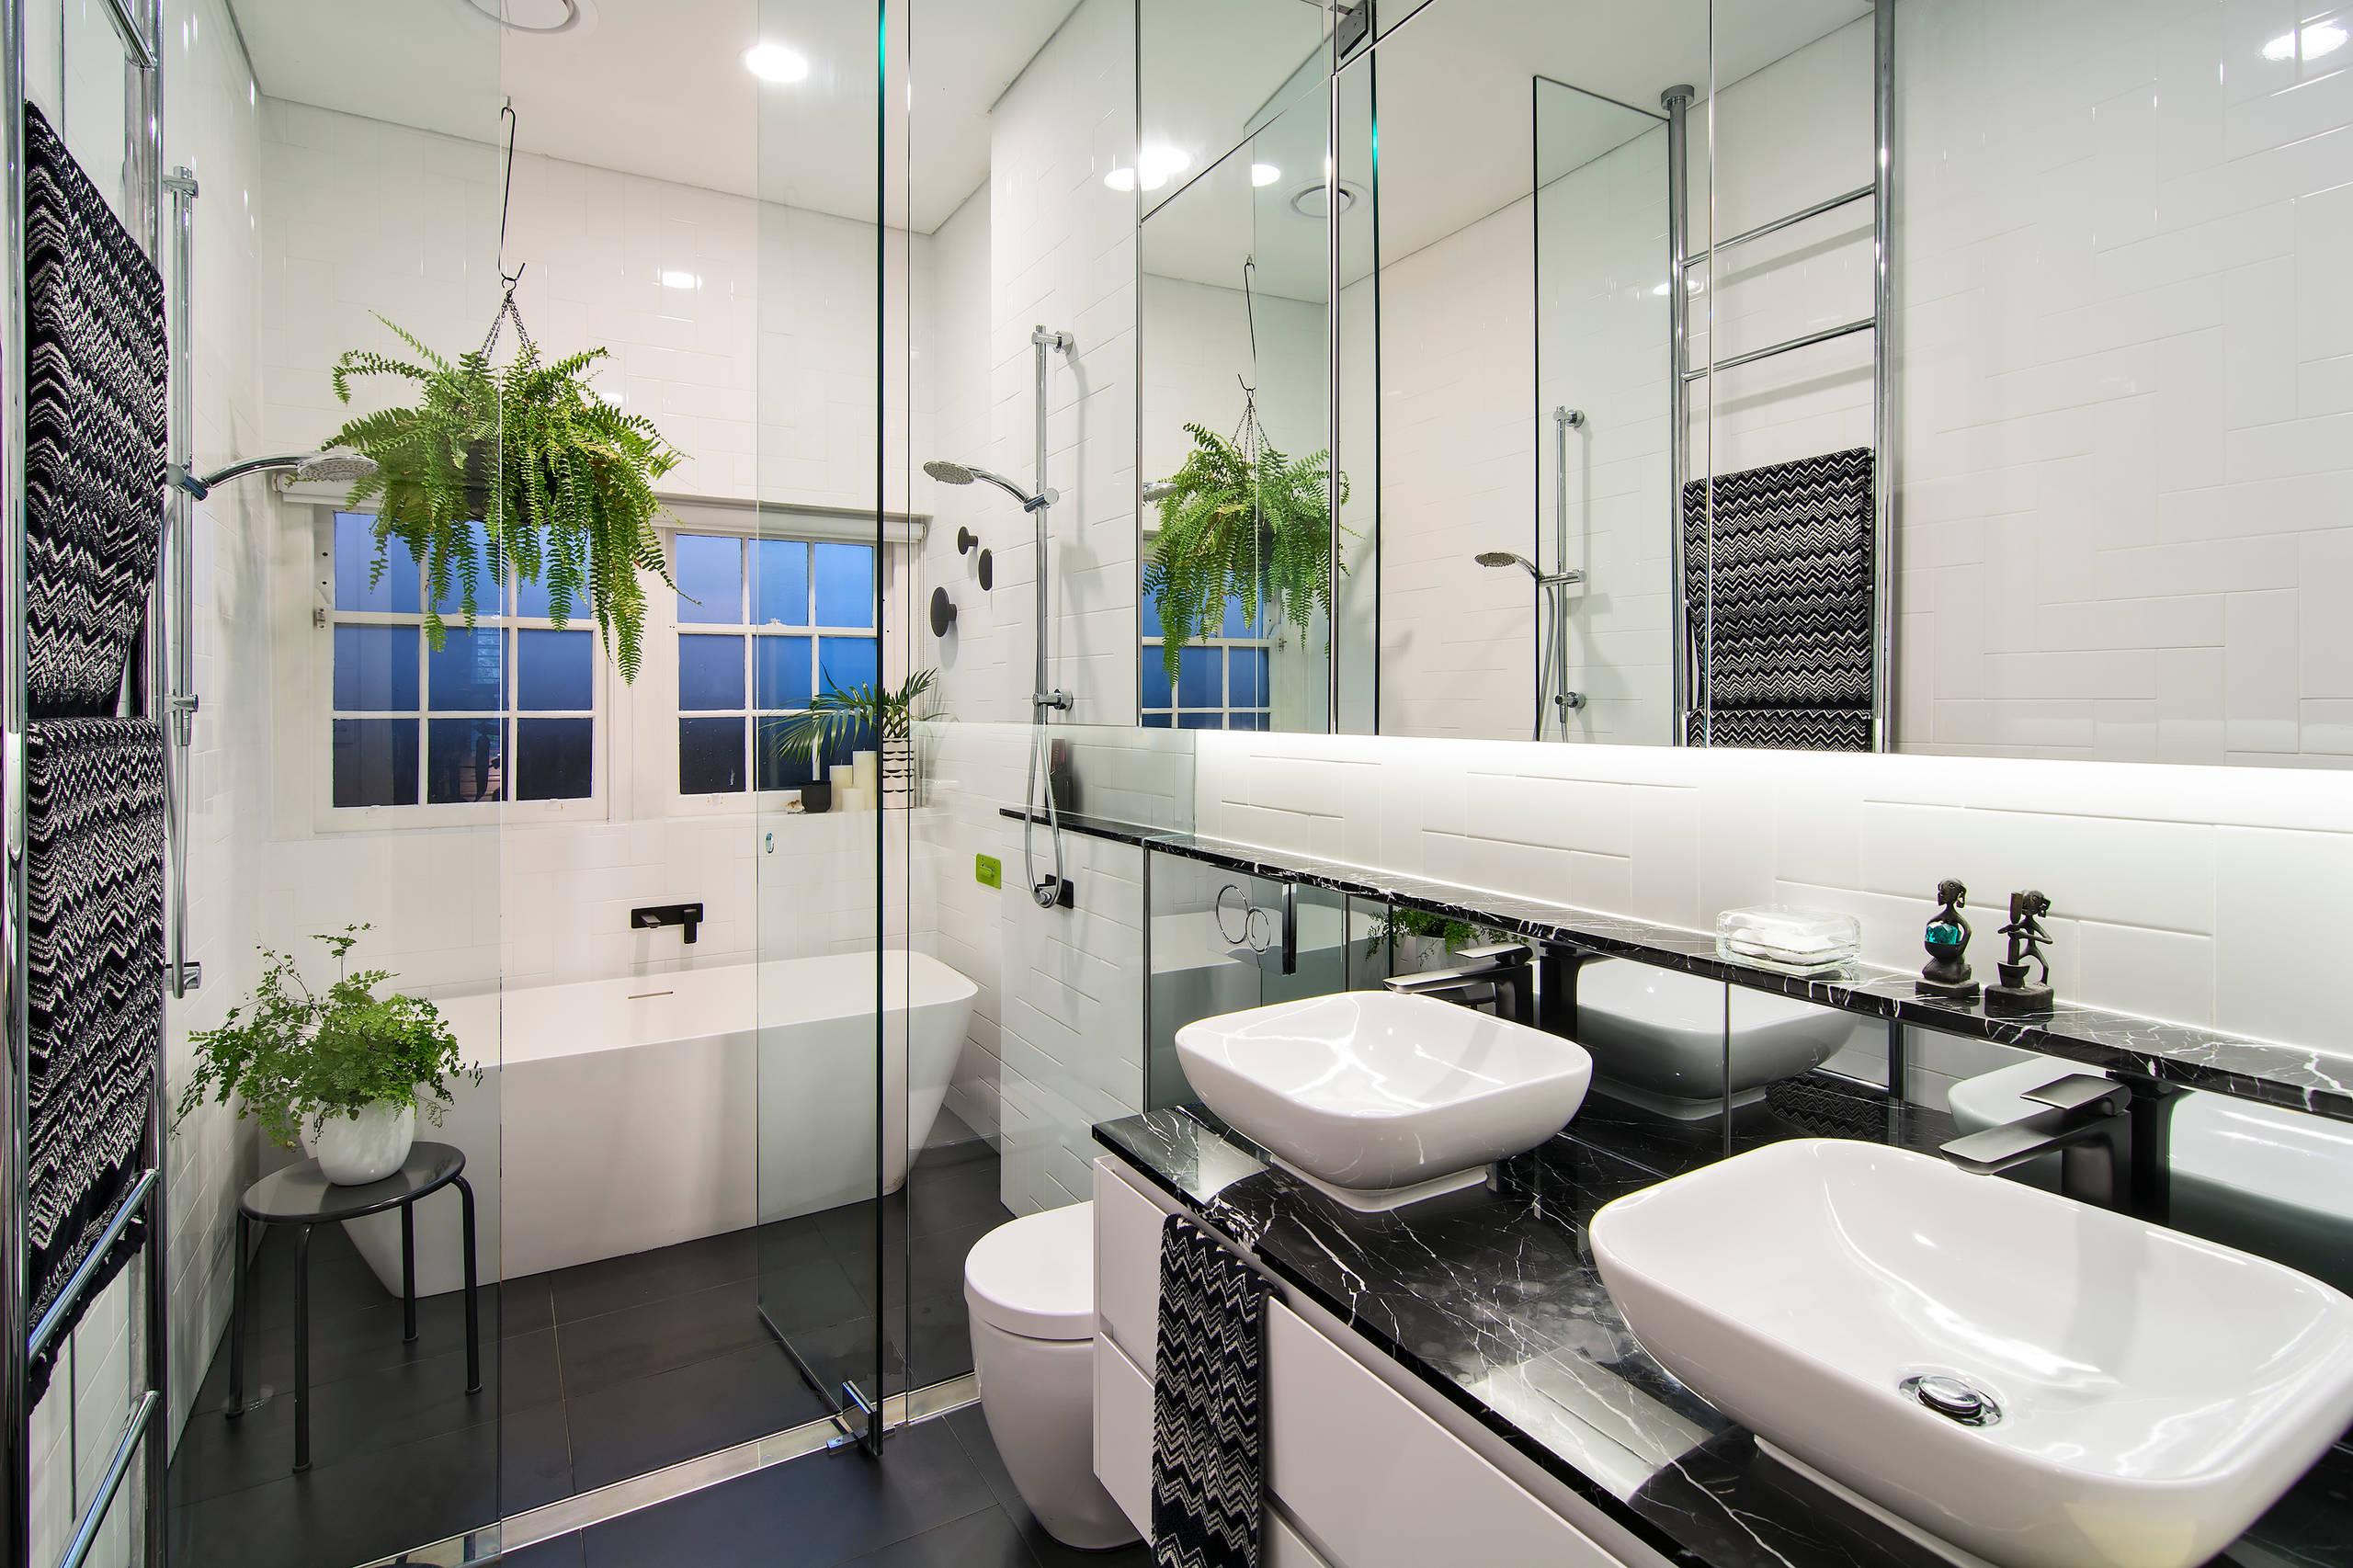 Renovation Of 1920s Bungalow Bathroom Ideas Photos Houzz